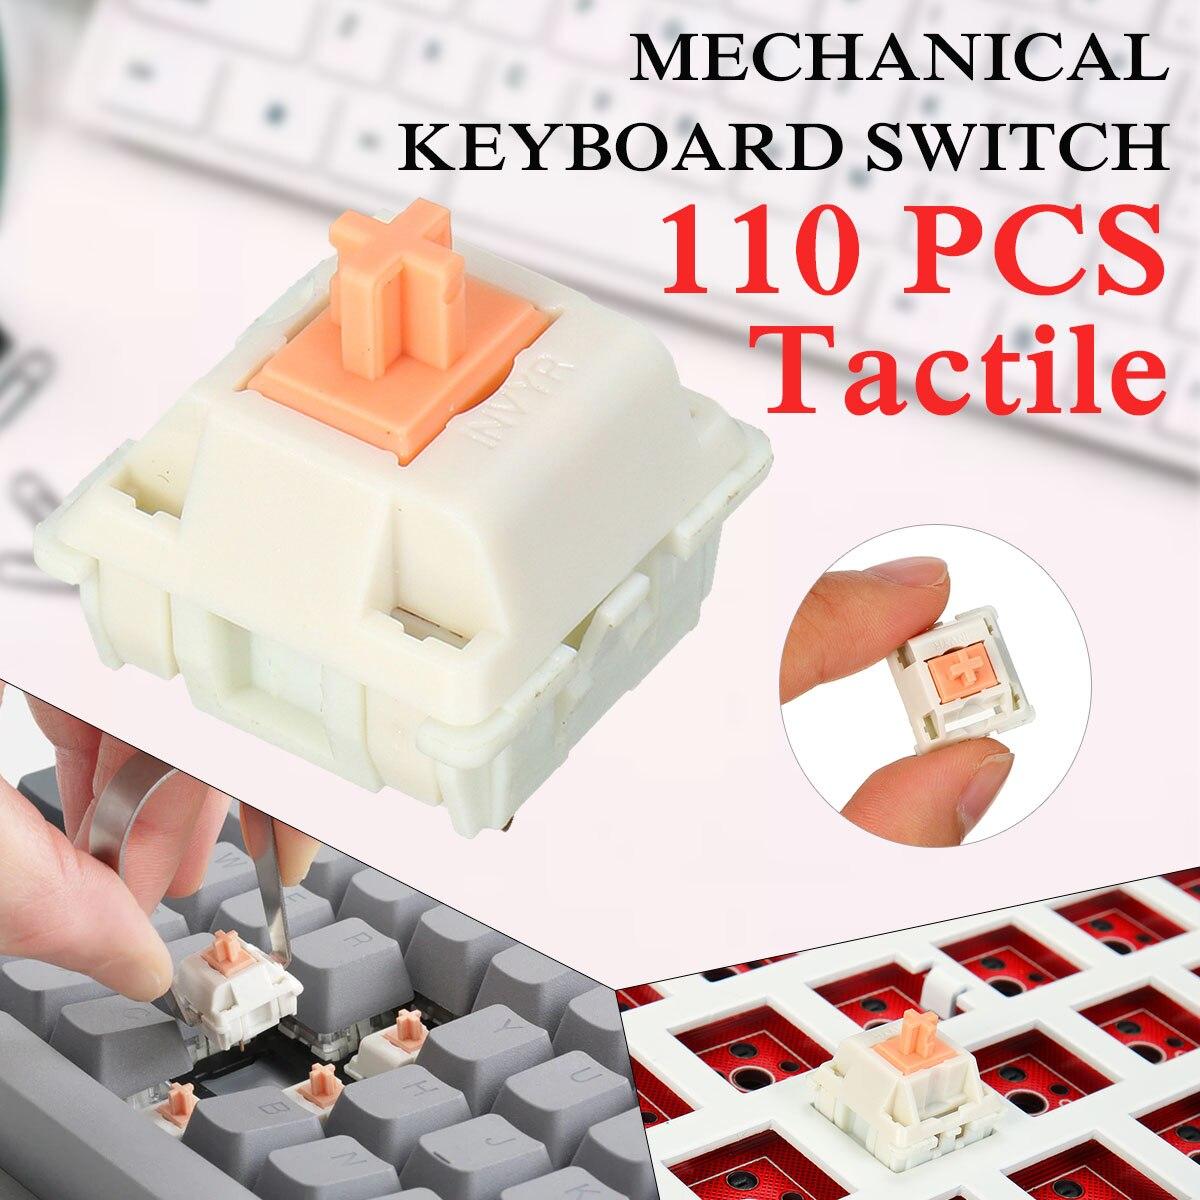 FEKER 110 Keys Like Holy Panda 3 Pin Mechanical Switch Keyboard Replacement  Mechanical Keyboard Shaft Body DIY Accessories